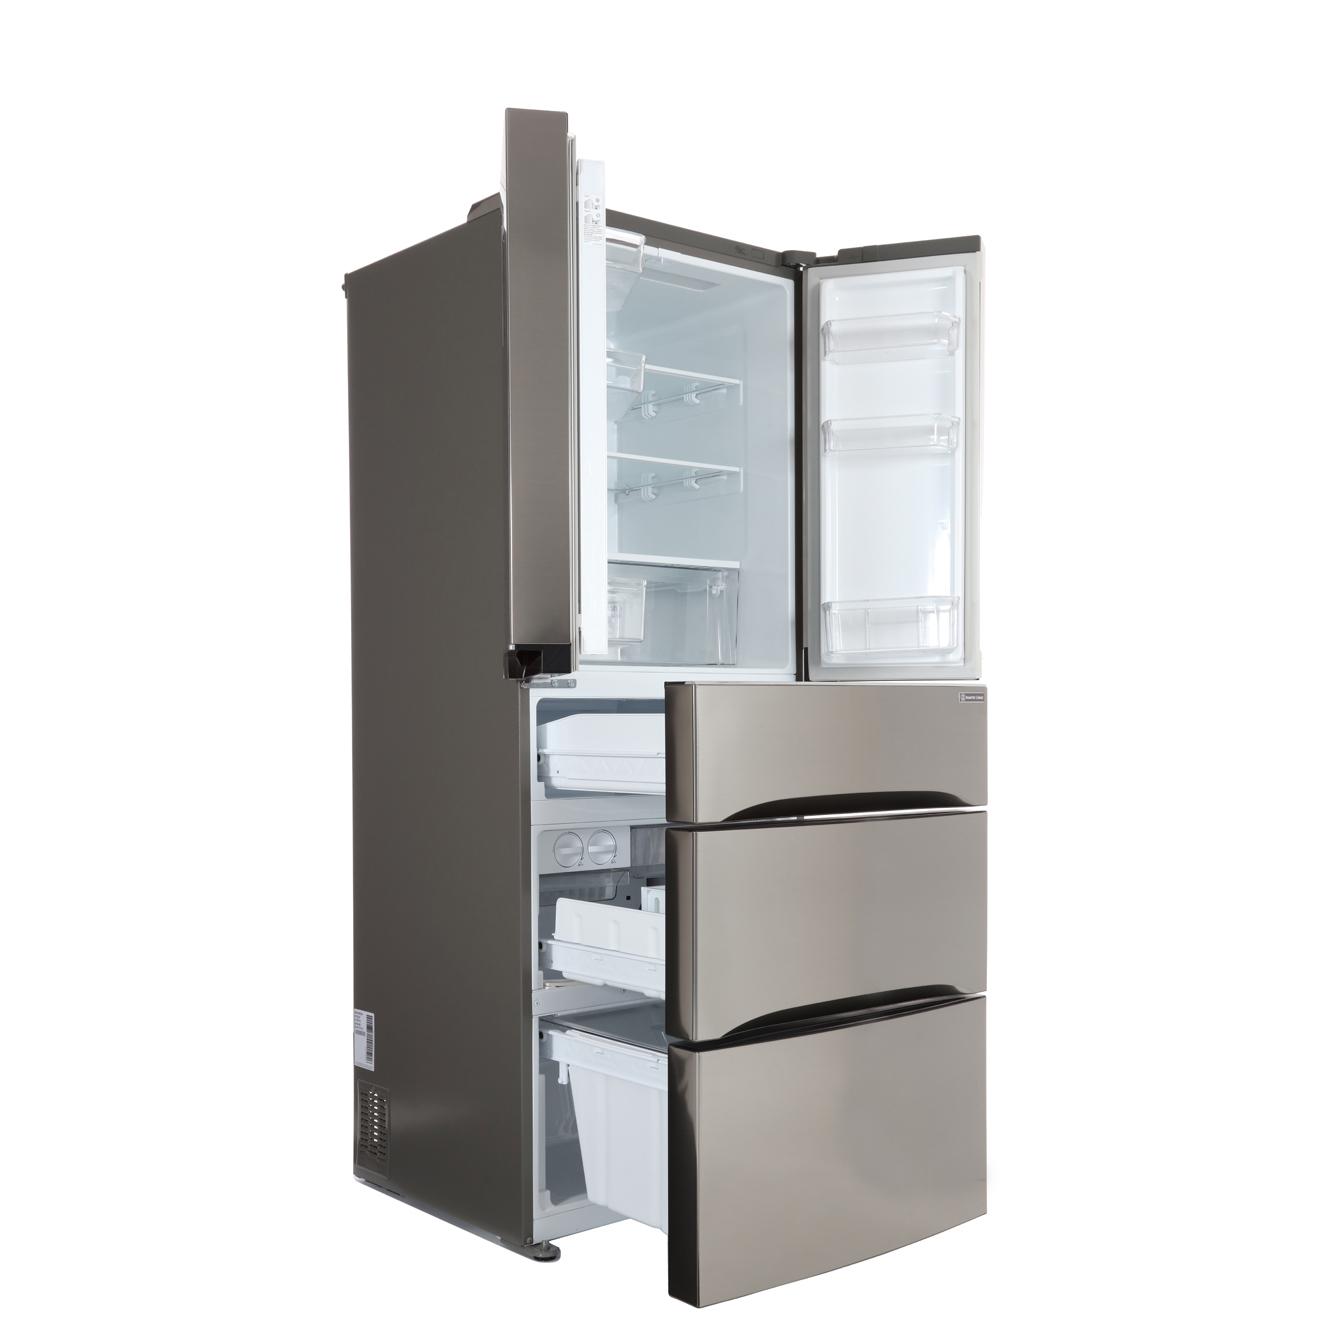 Buy Lg Gb6140pzqv American Fridge Freezer Shiny Steel